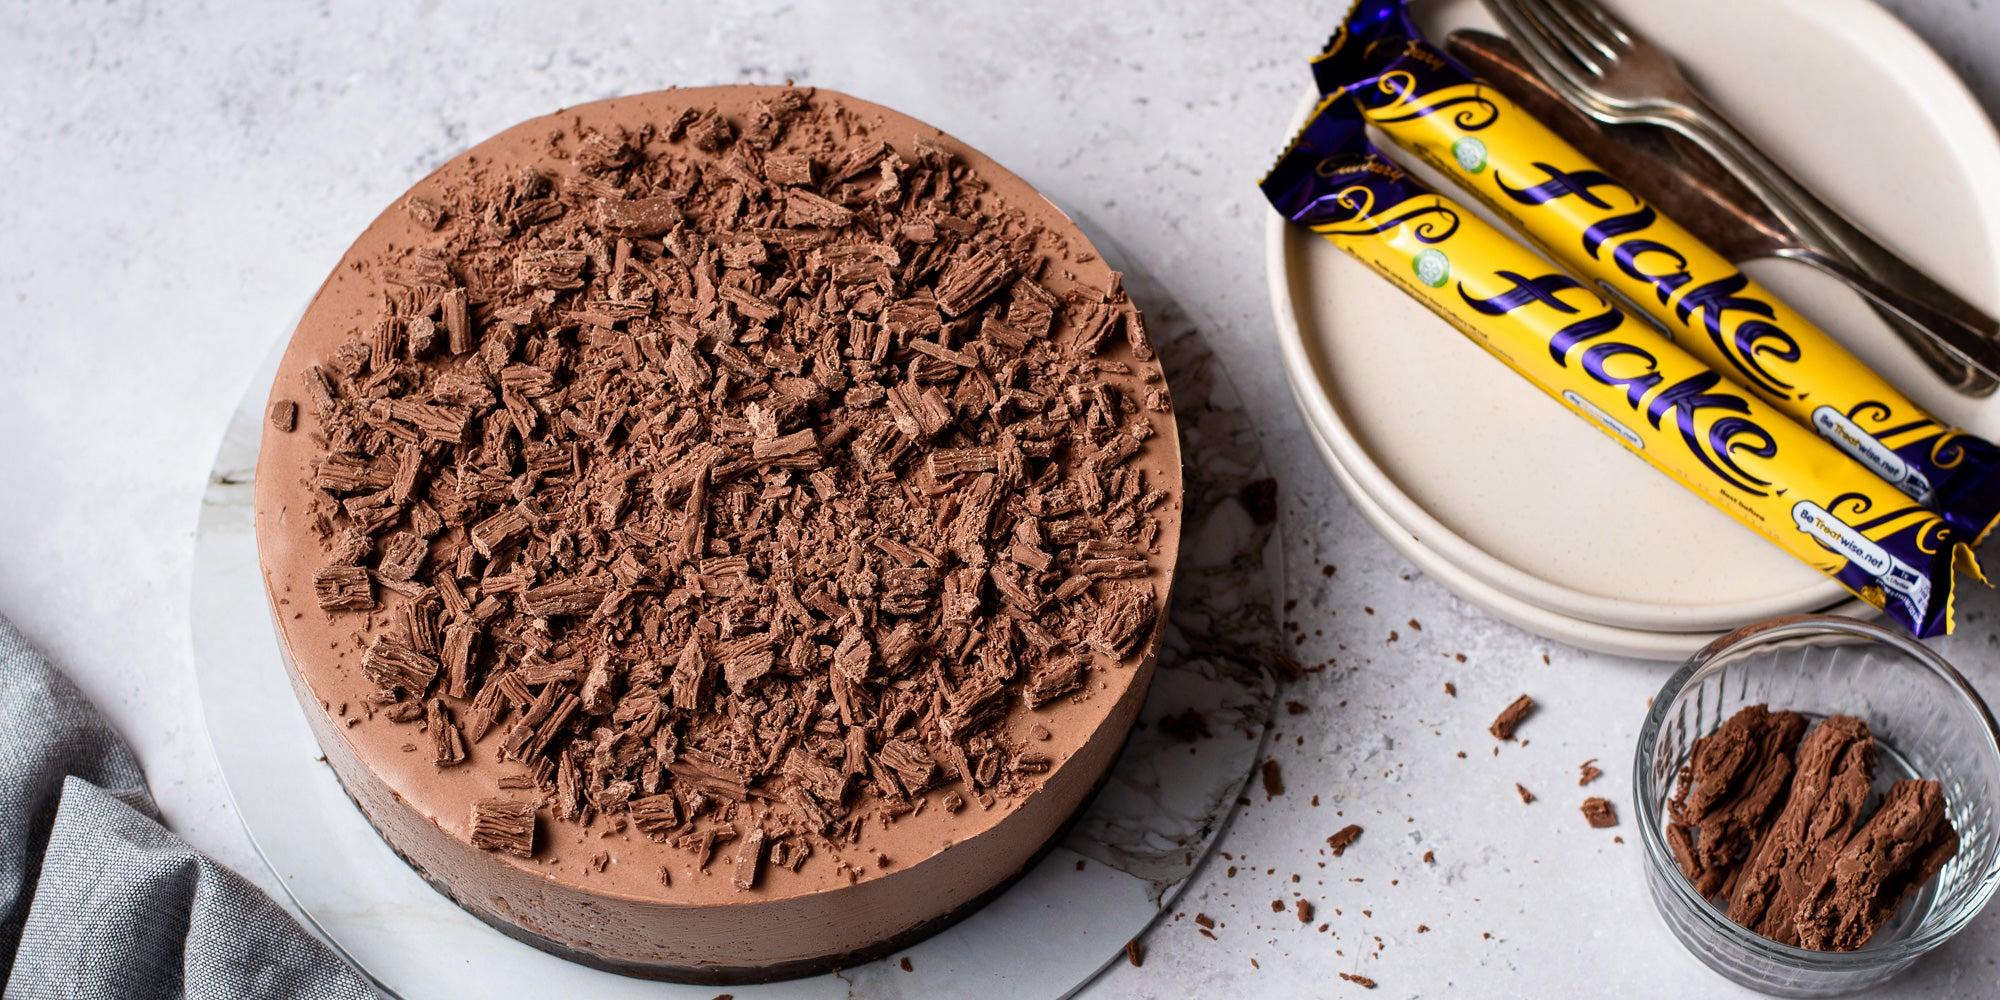 No bake chocolate flake cheesecake